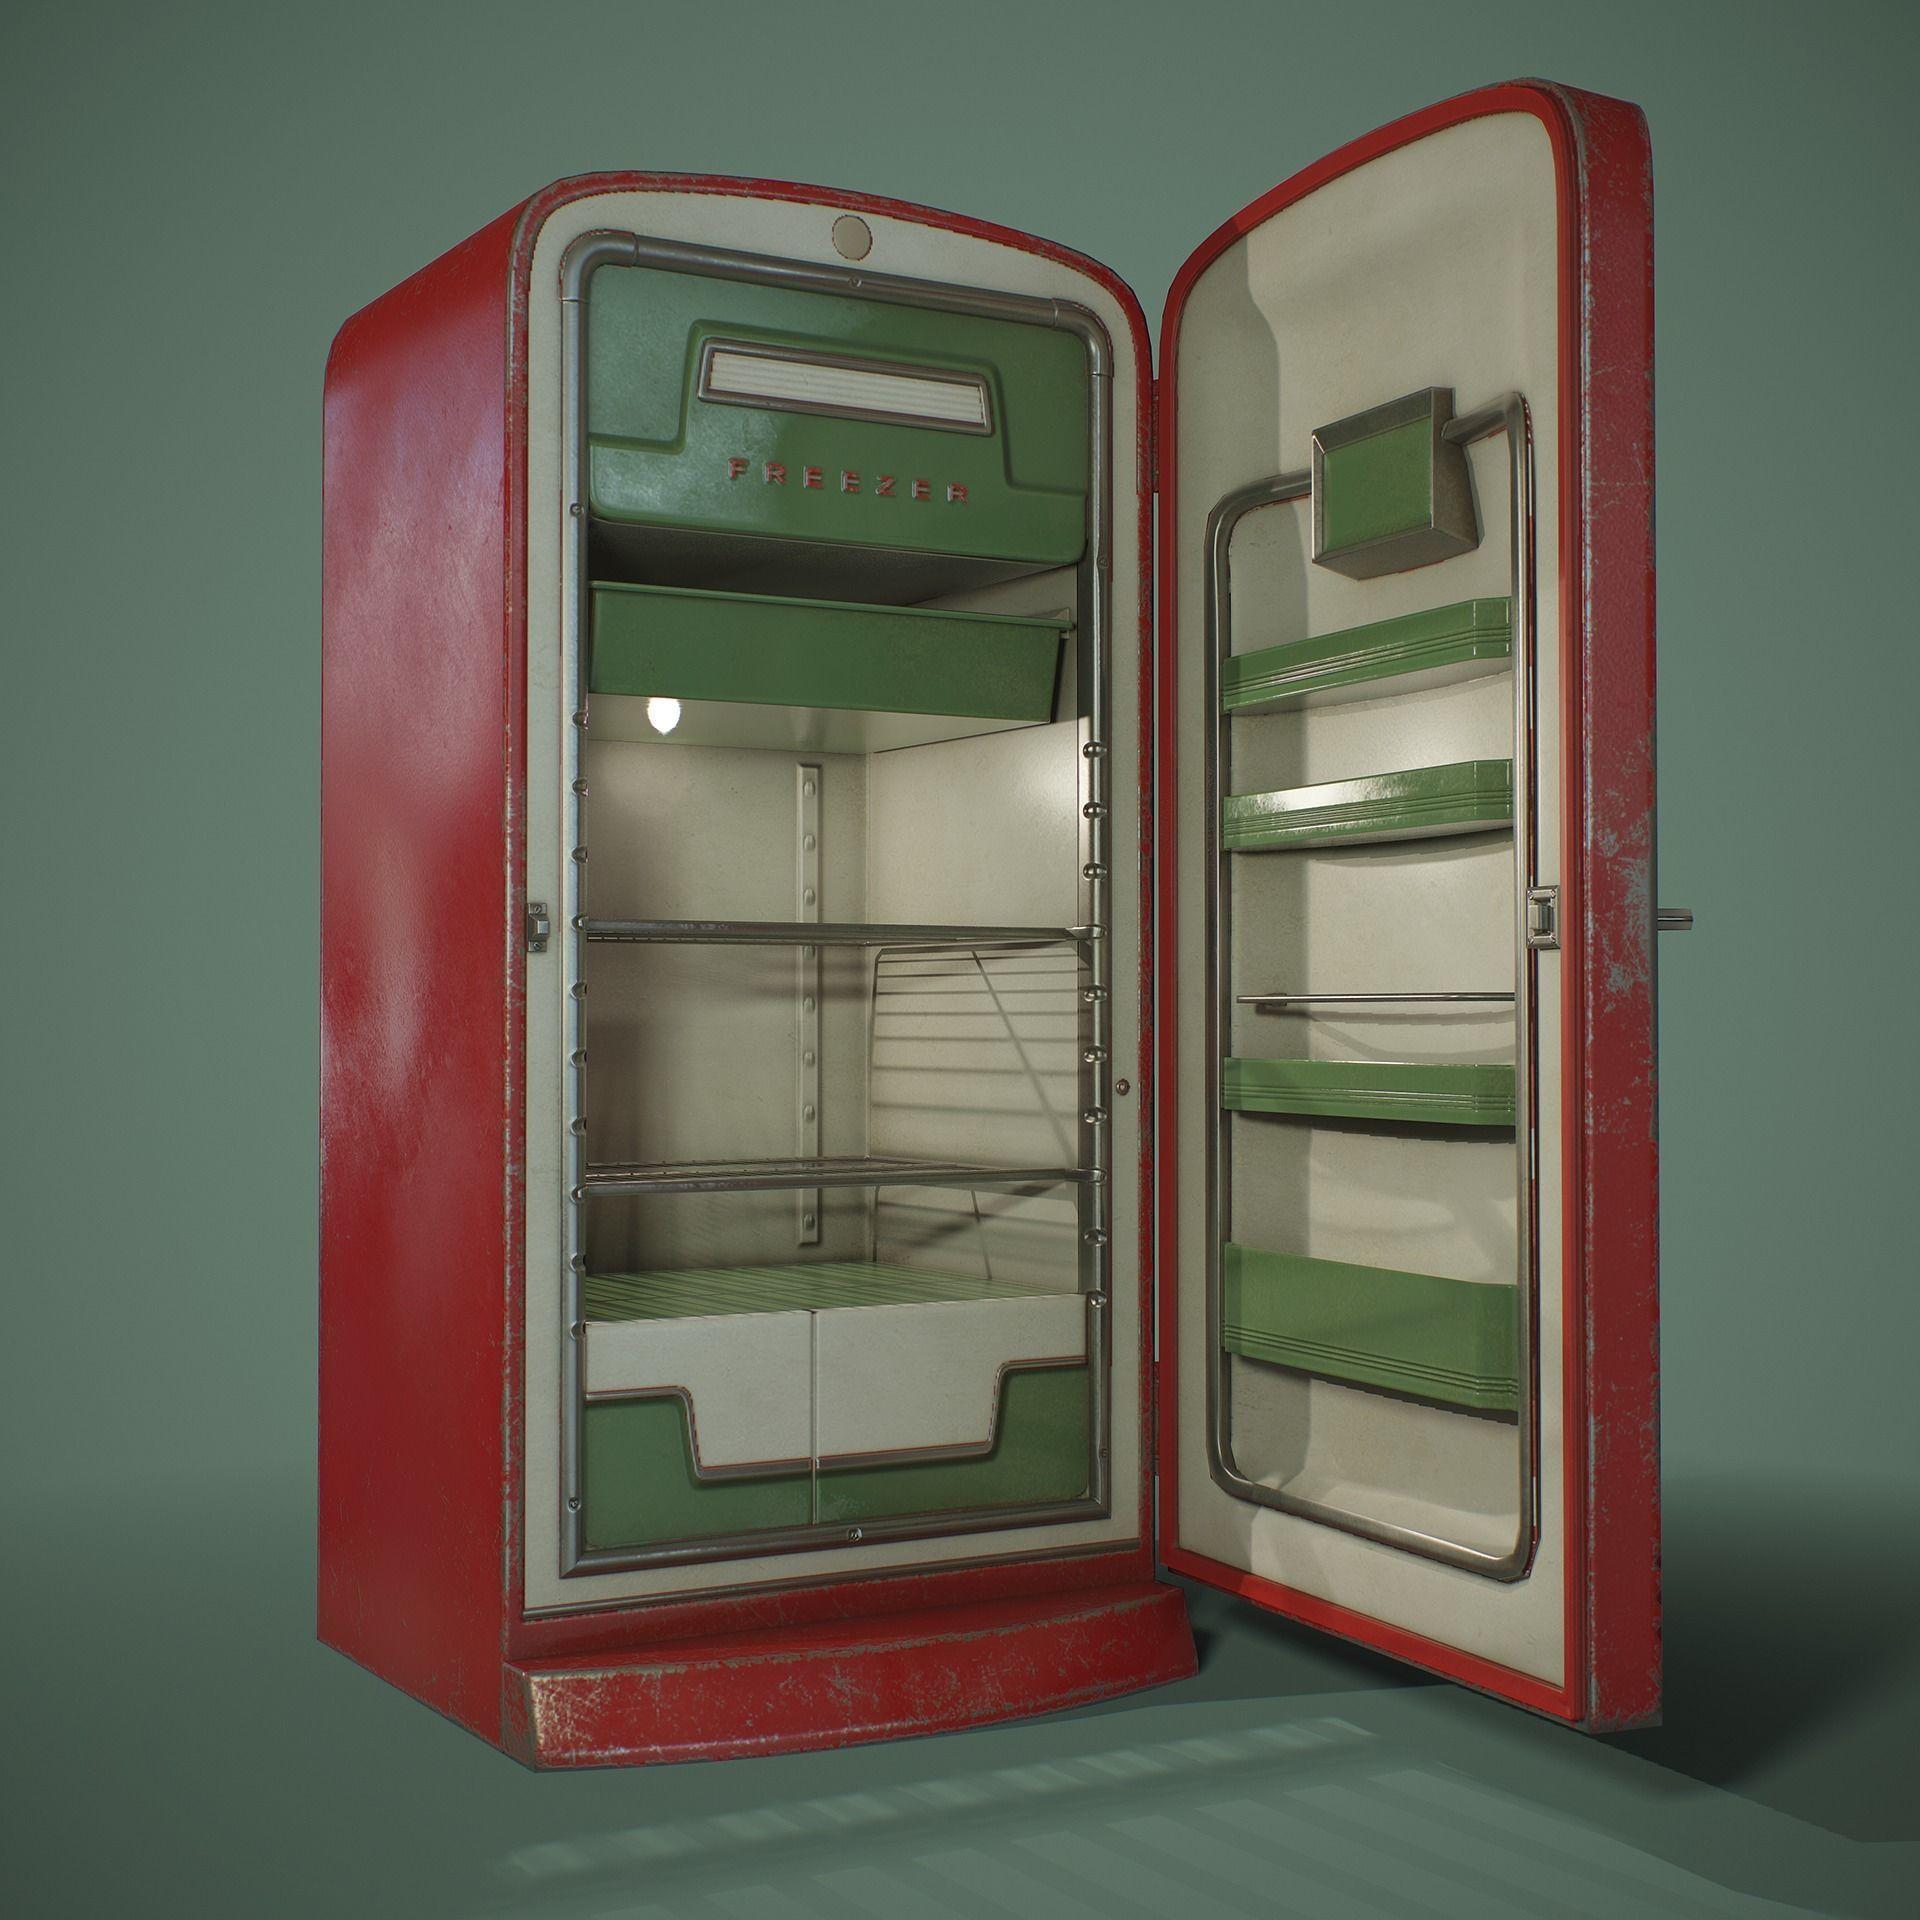 PBR Retro Refrigerator